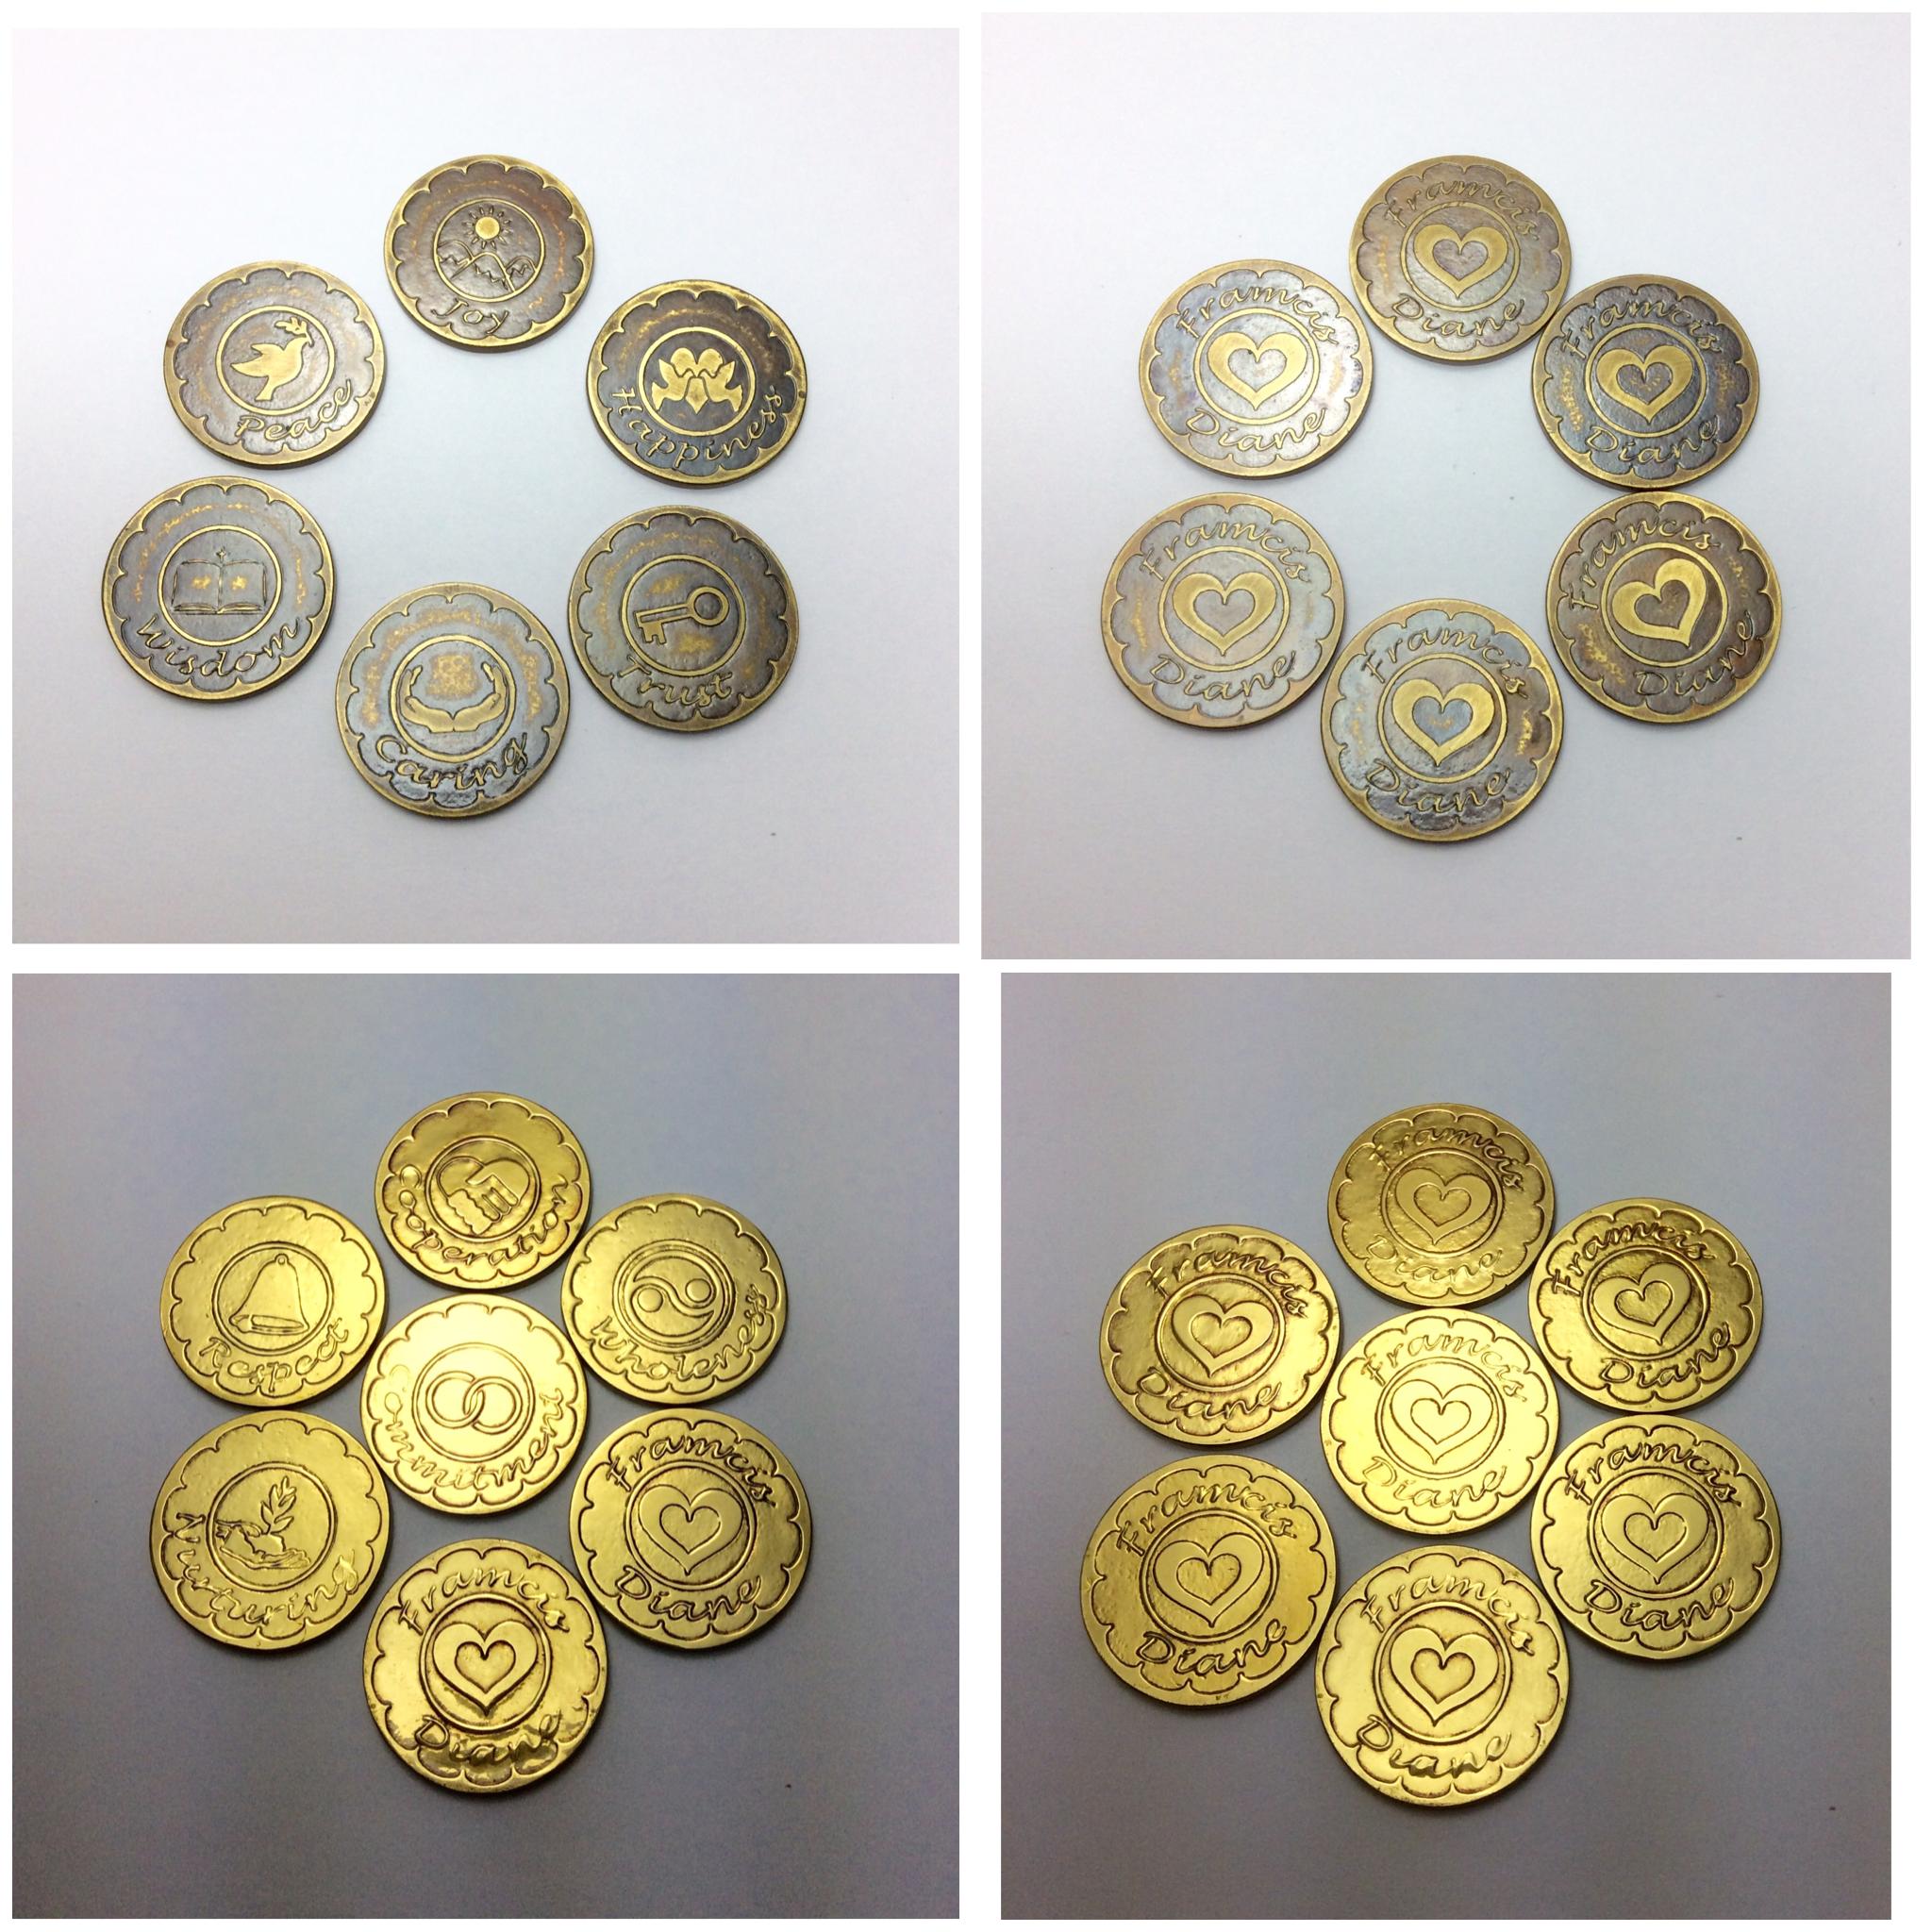 Personalized unity coins wedding arrhae arras 13pcs with symbols personalized unity coins wedding arrhae arras 13pcs with symbols showing the 13 tenets of biocorpaavc